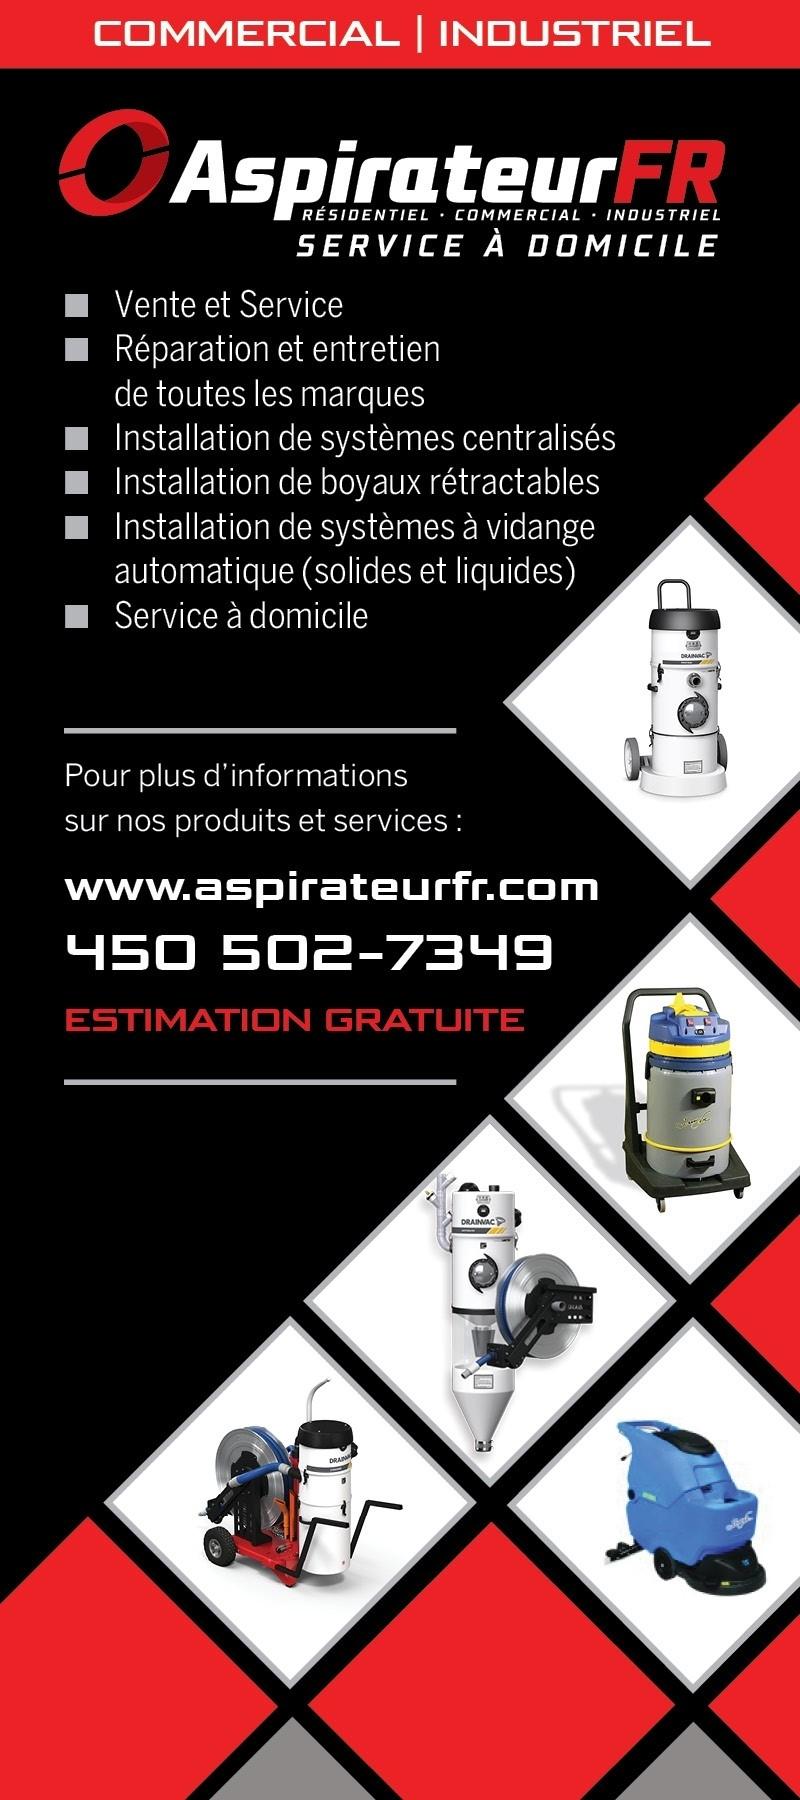 Aspirateur FR - Saint-Hyacinthe, QC J2R 2B7 - (450)502-7349 | ShowMeLocal.com